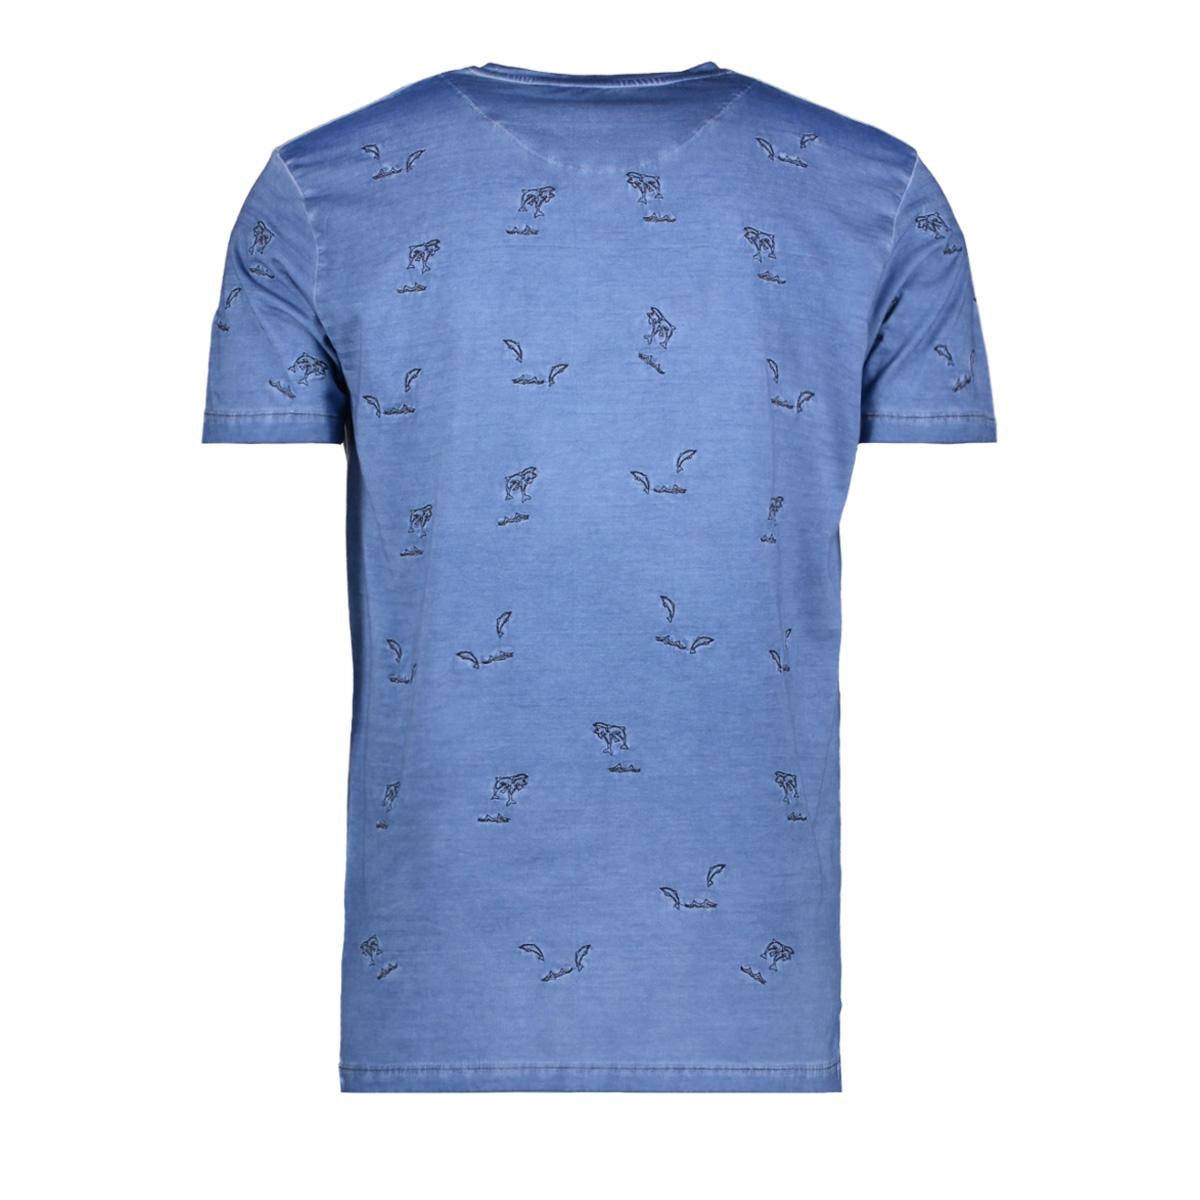 13897 gabbiano t-shirt light blue